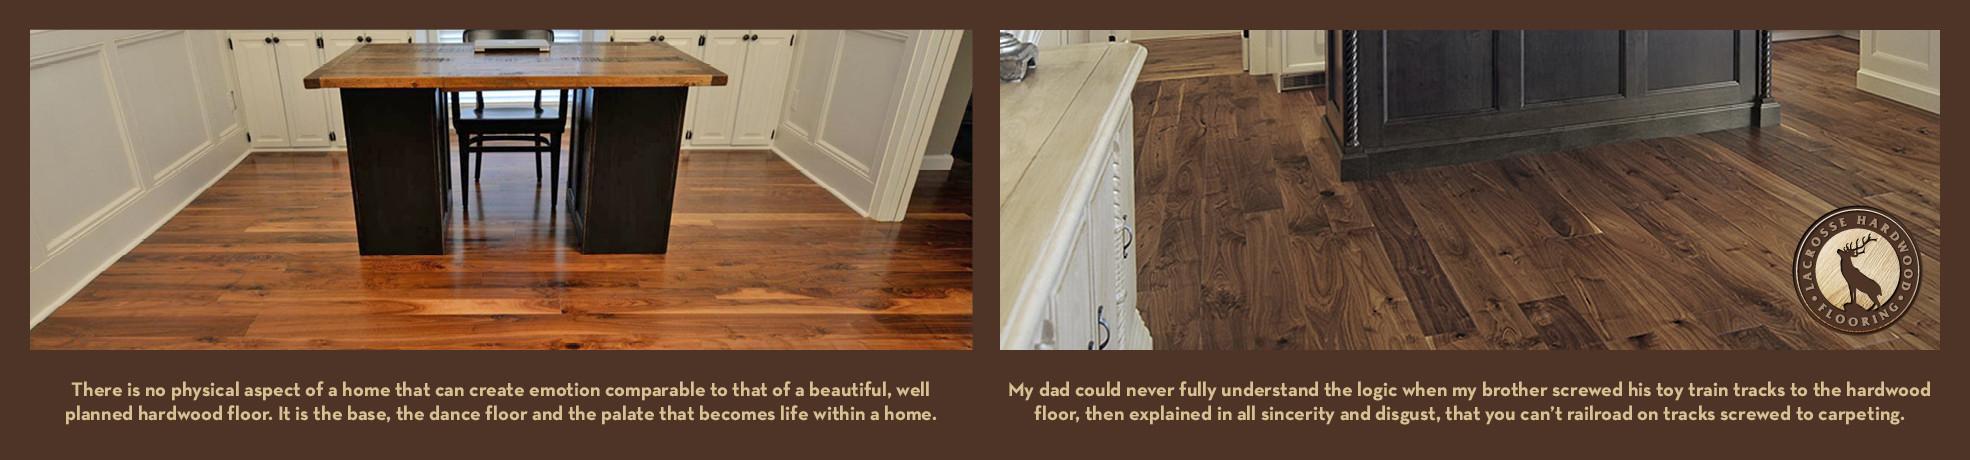 hardwood flooring prices and installation of lacrosse hardwood flooring walnut white oak red oak hickory intended for lhfsliderv22